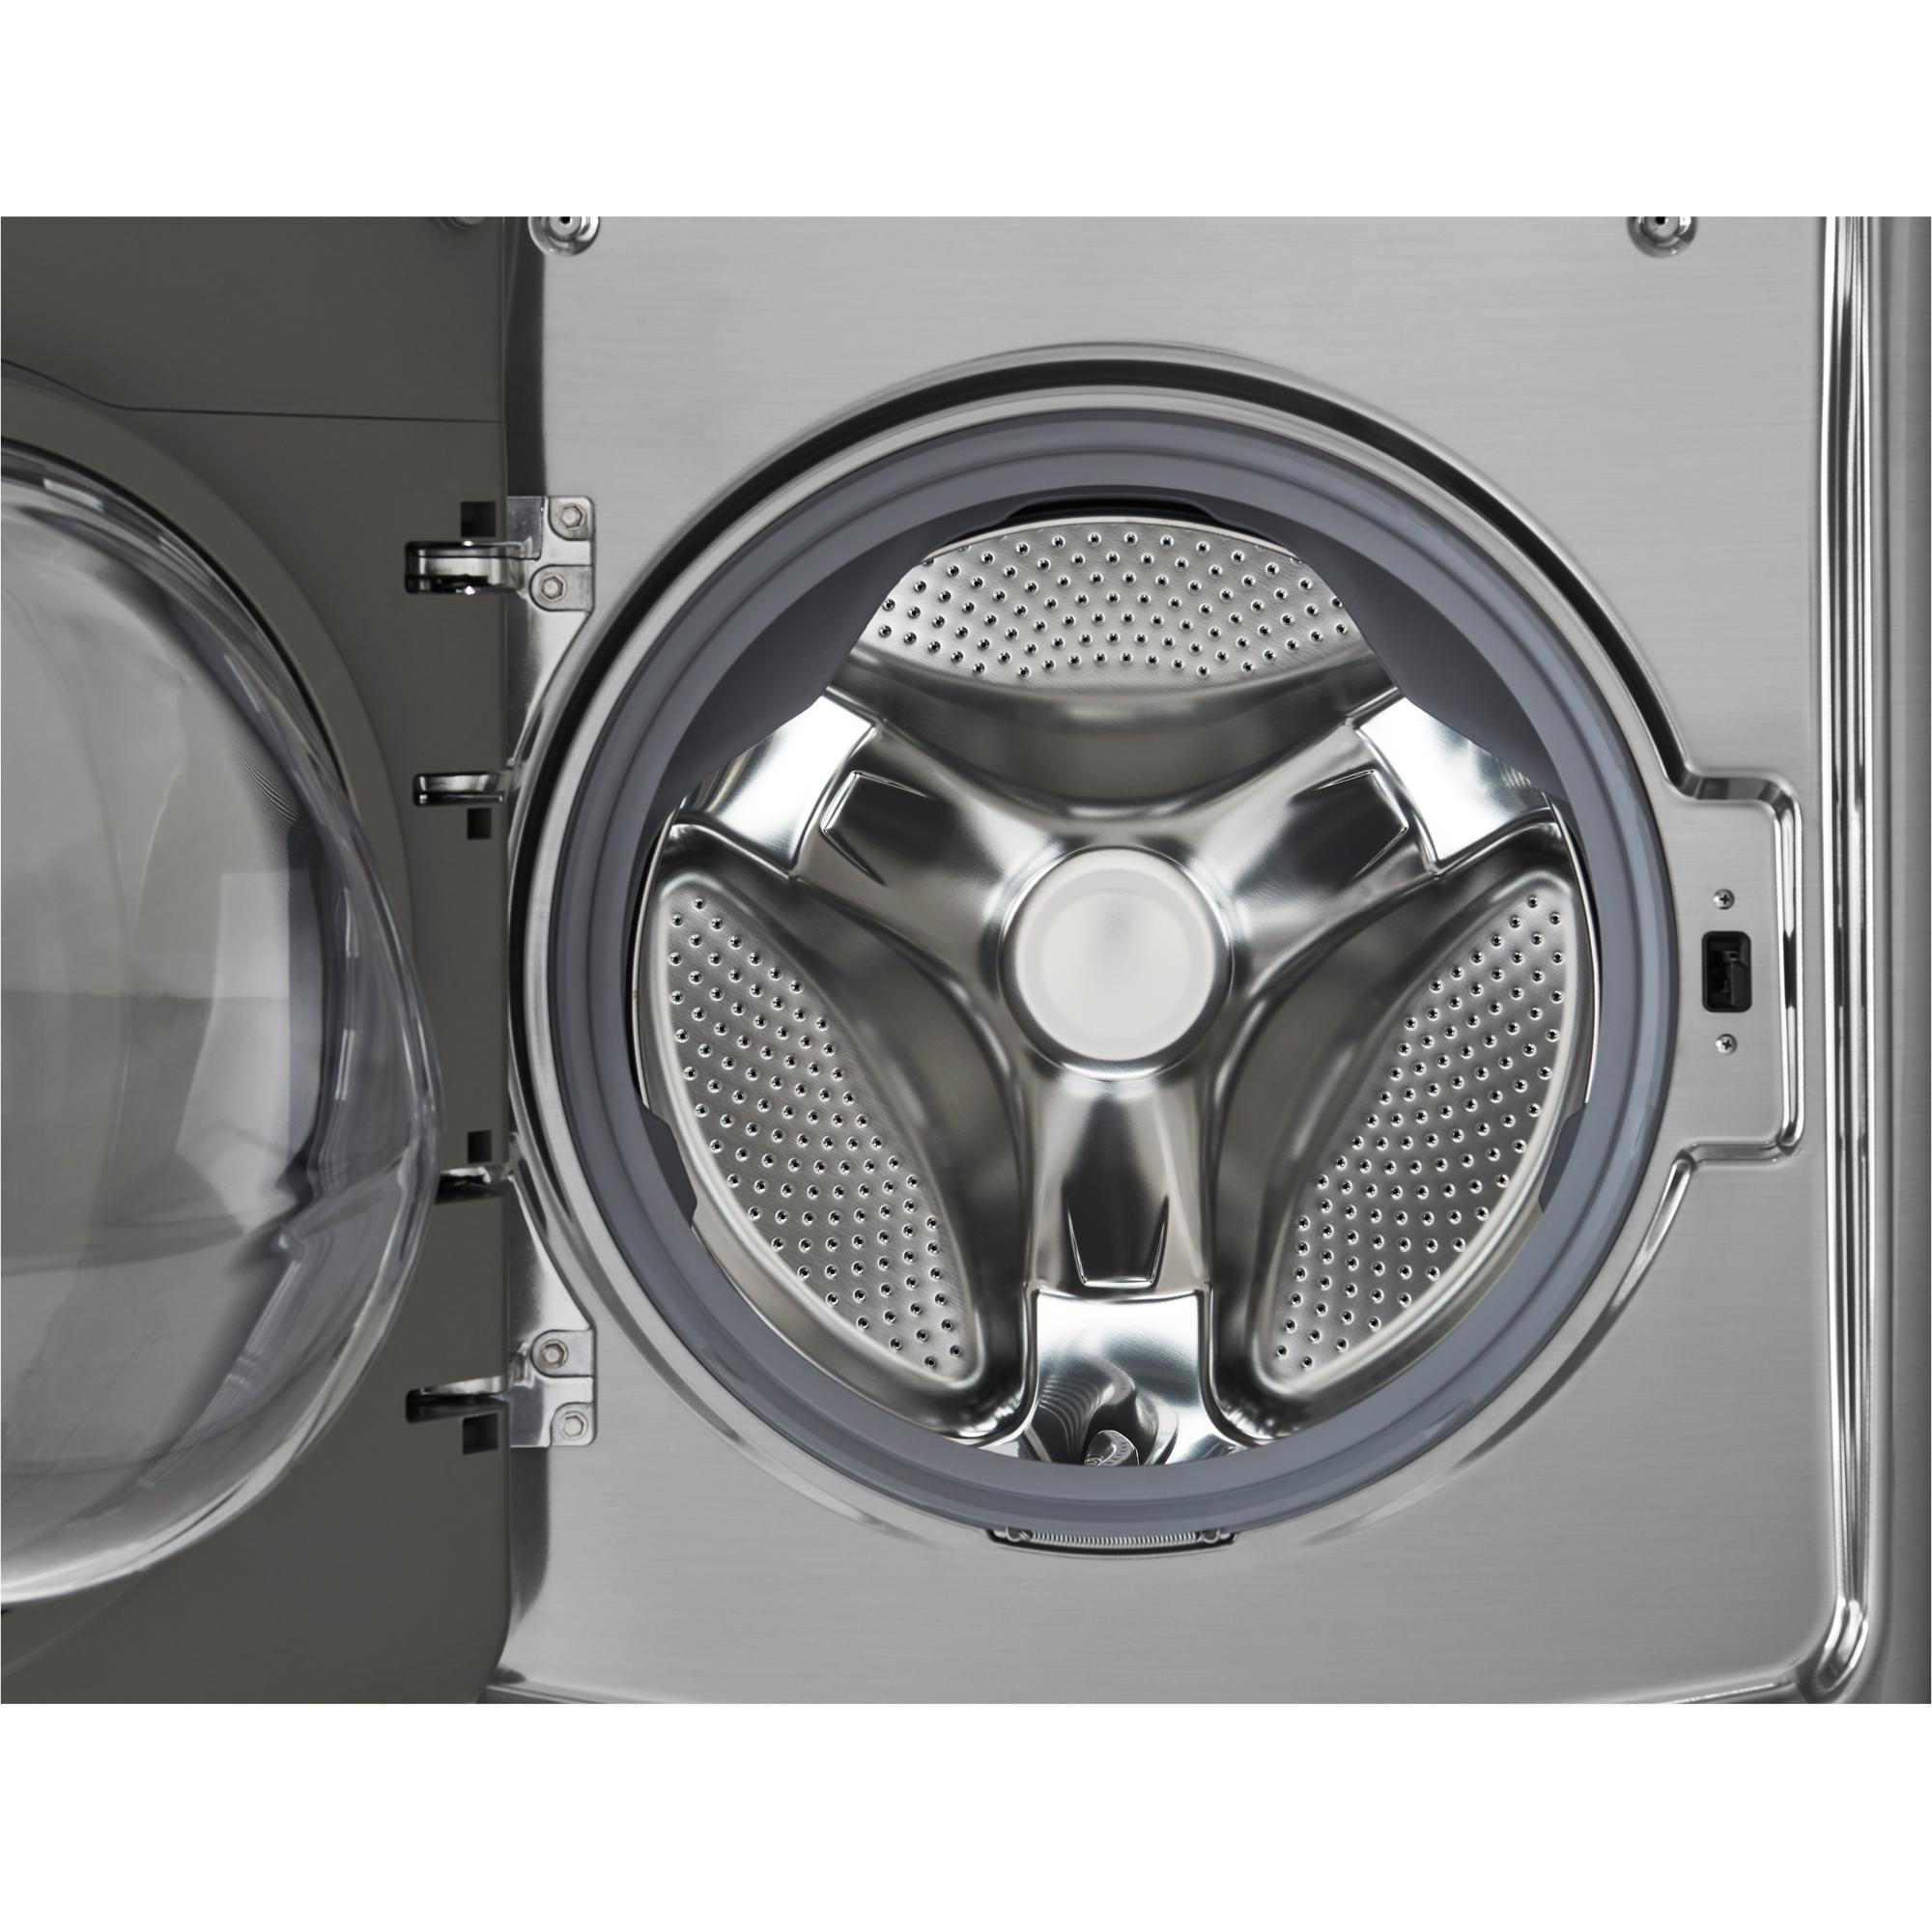 LG WM5000HVA 4.5 cu. ft. Ultra-Large Capacity Front Load Washer w/ TurboWash® Technology – Graphite Steel